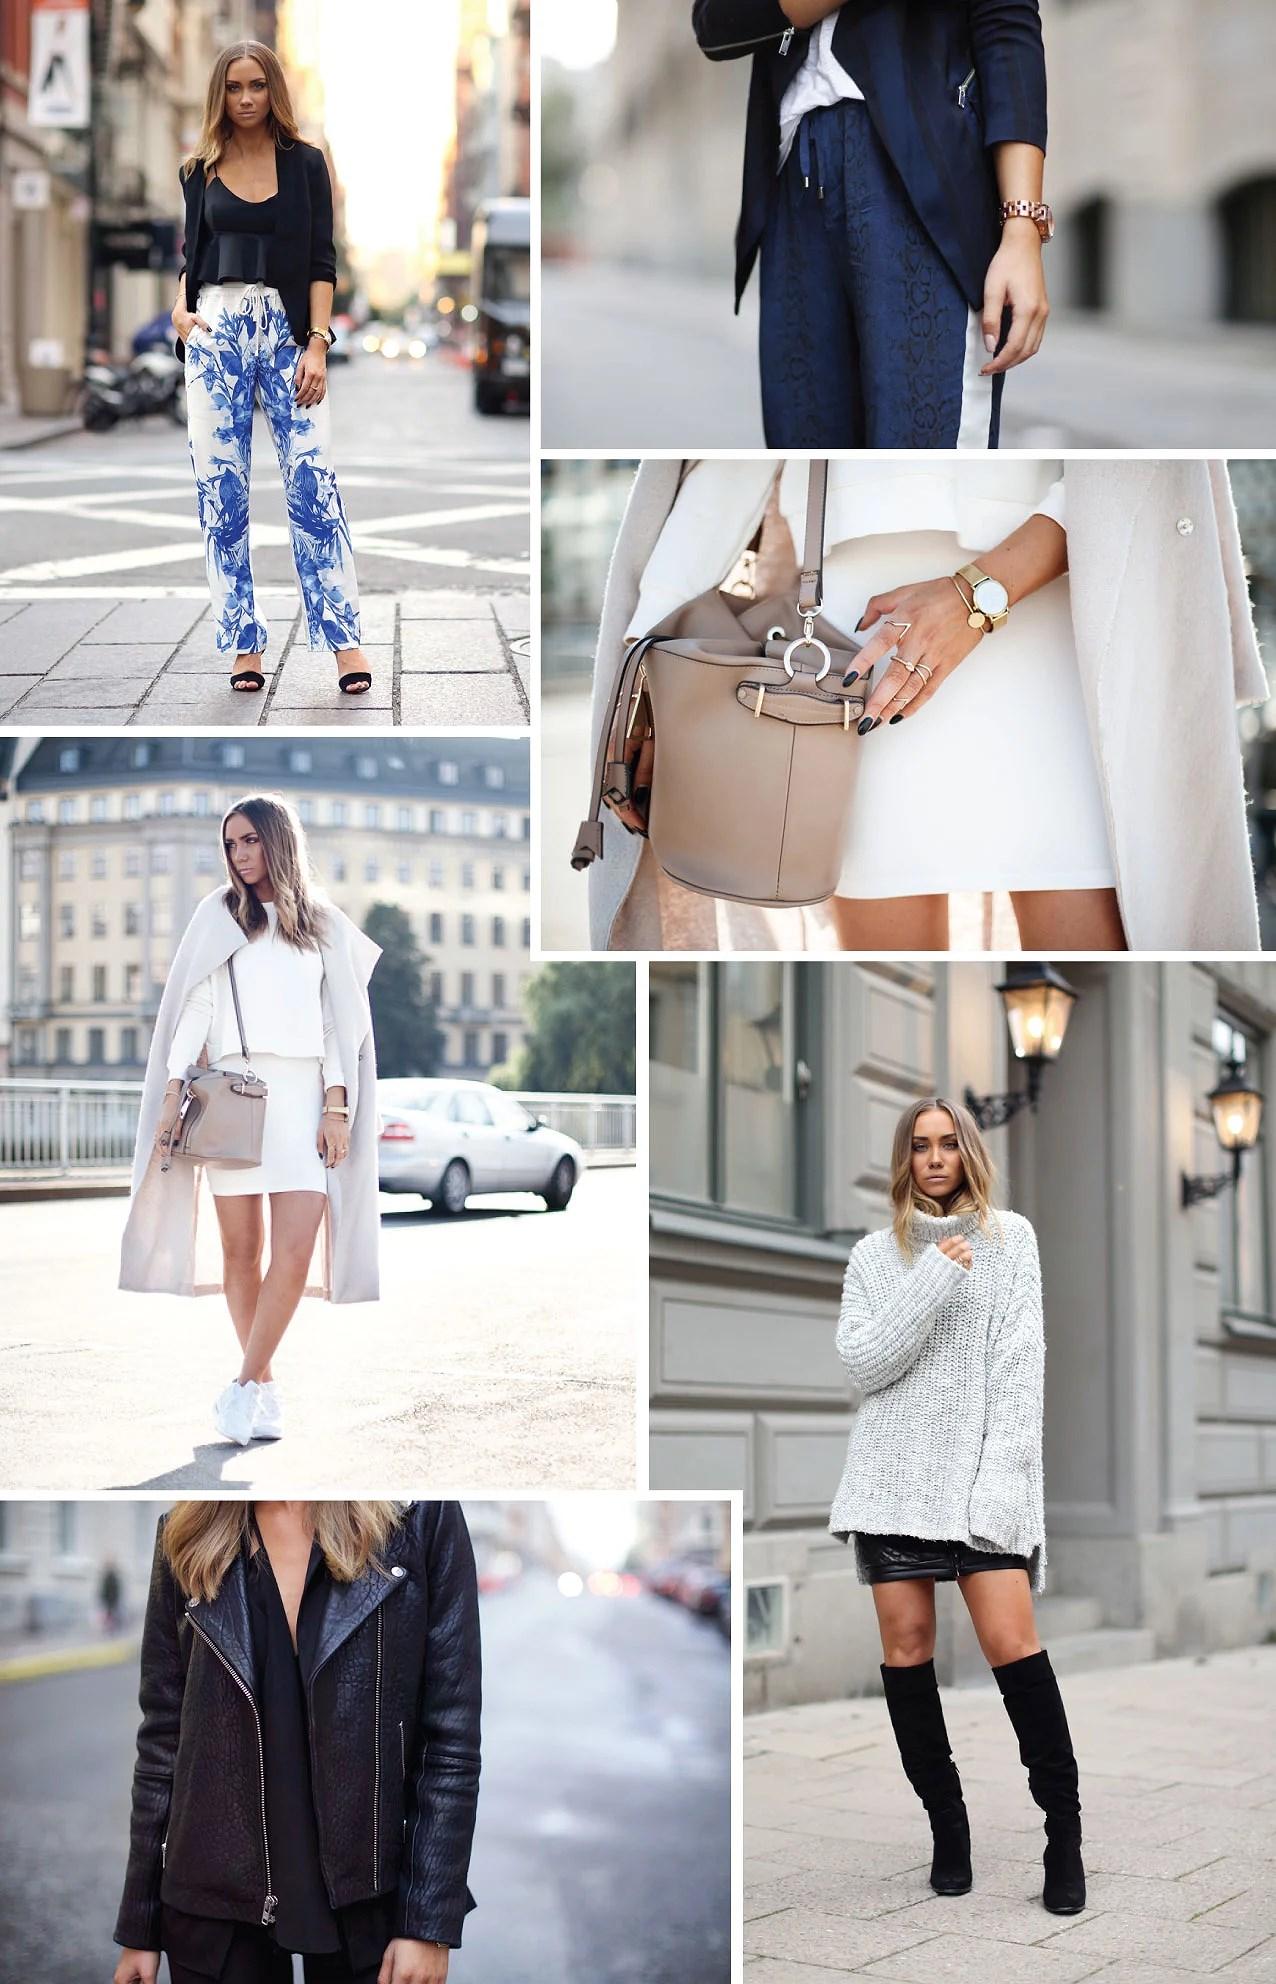 Modeblogger-aalborgblogger-aalborgmodeblog-JulieMænnchen